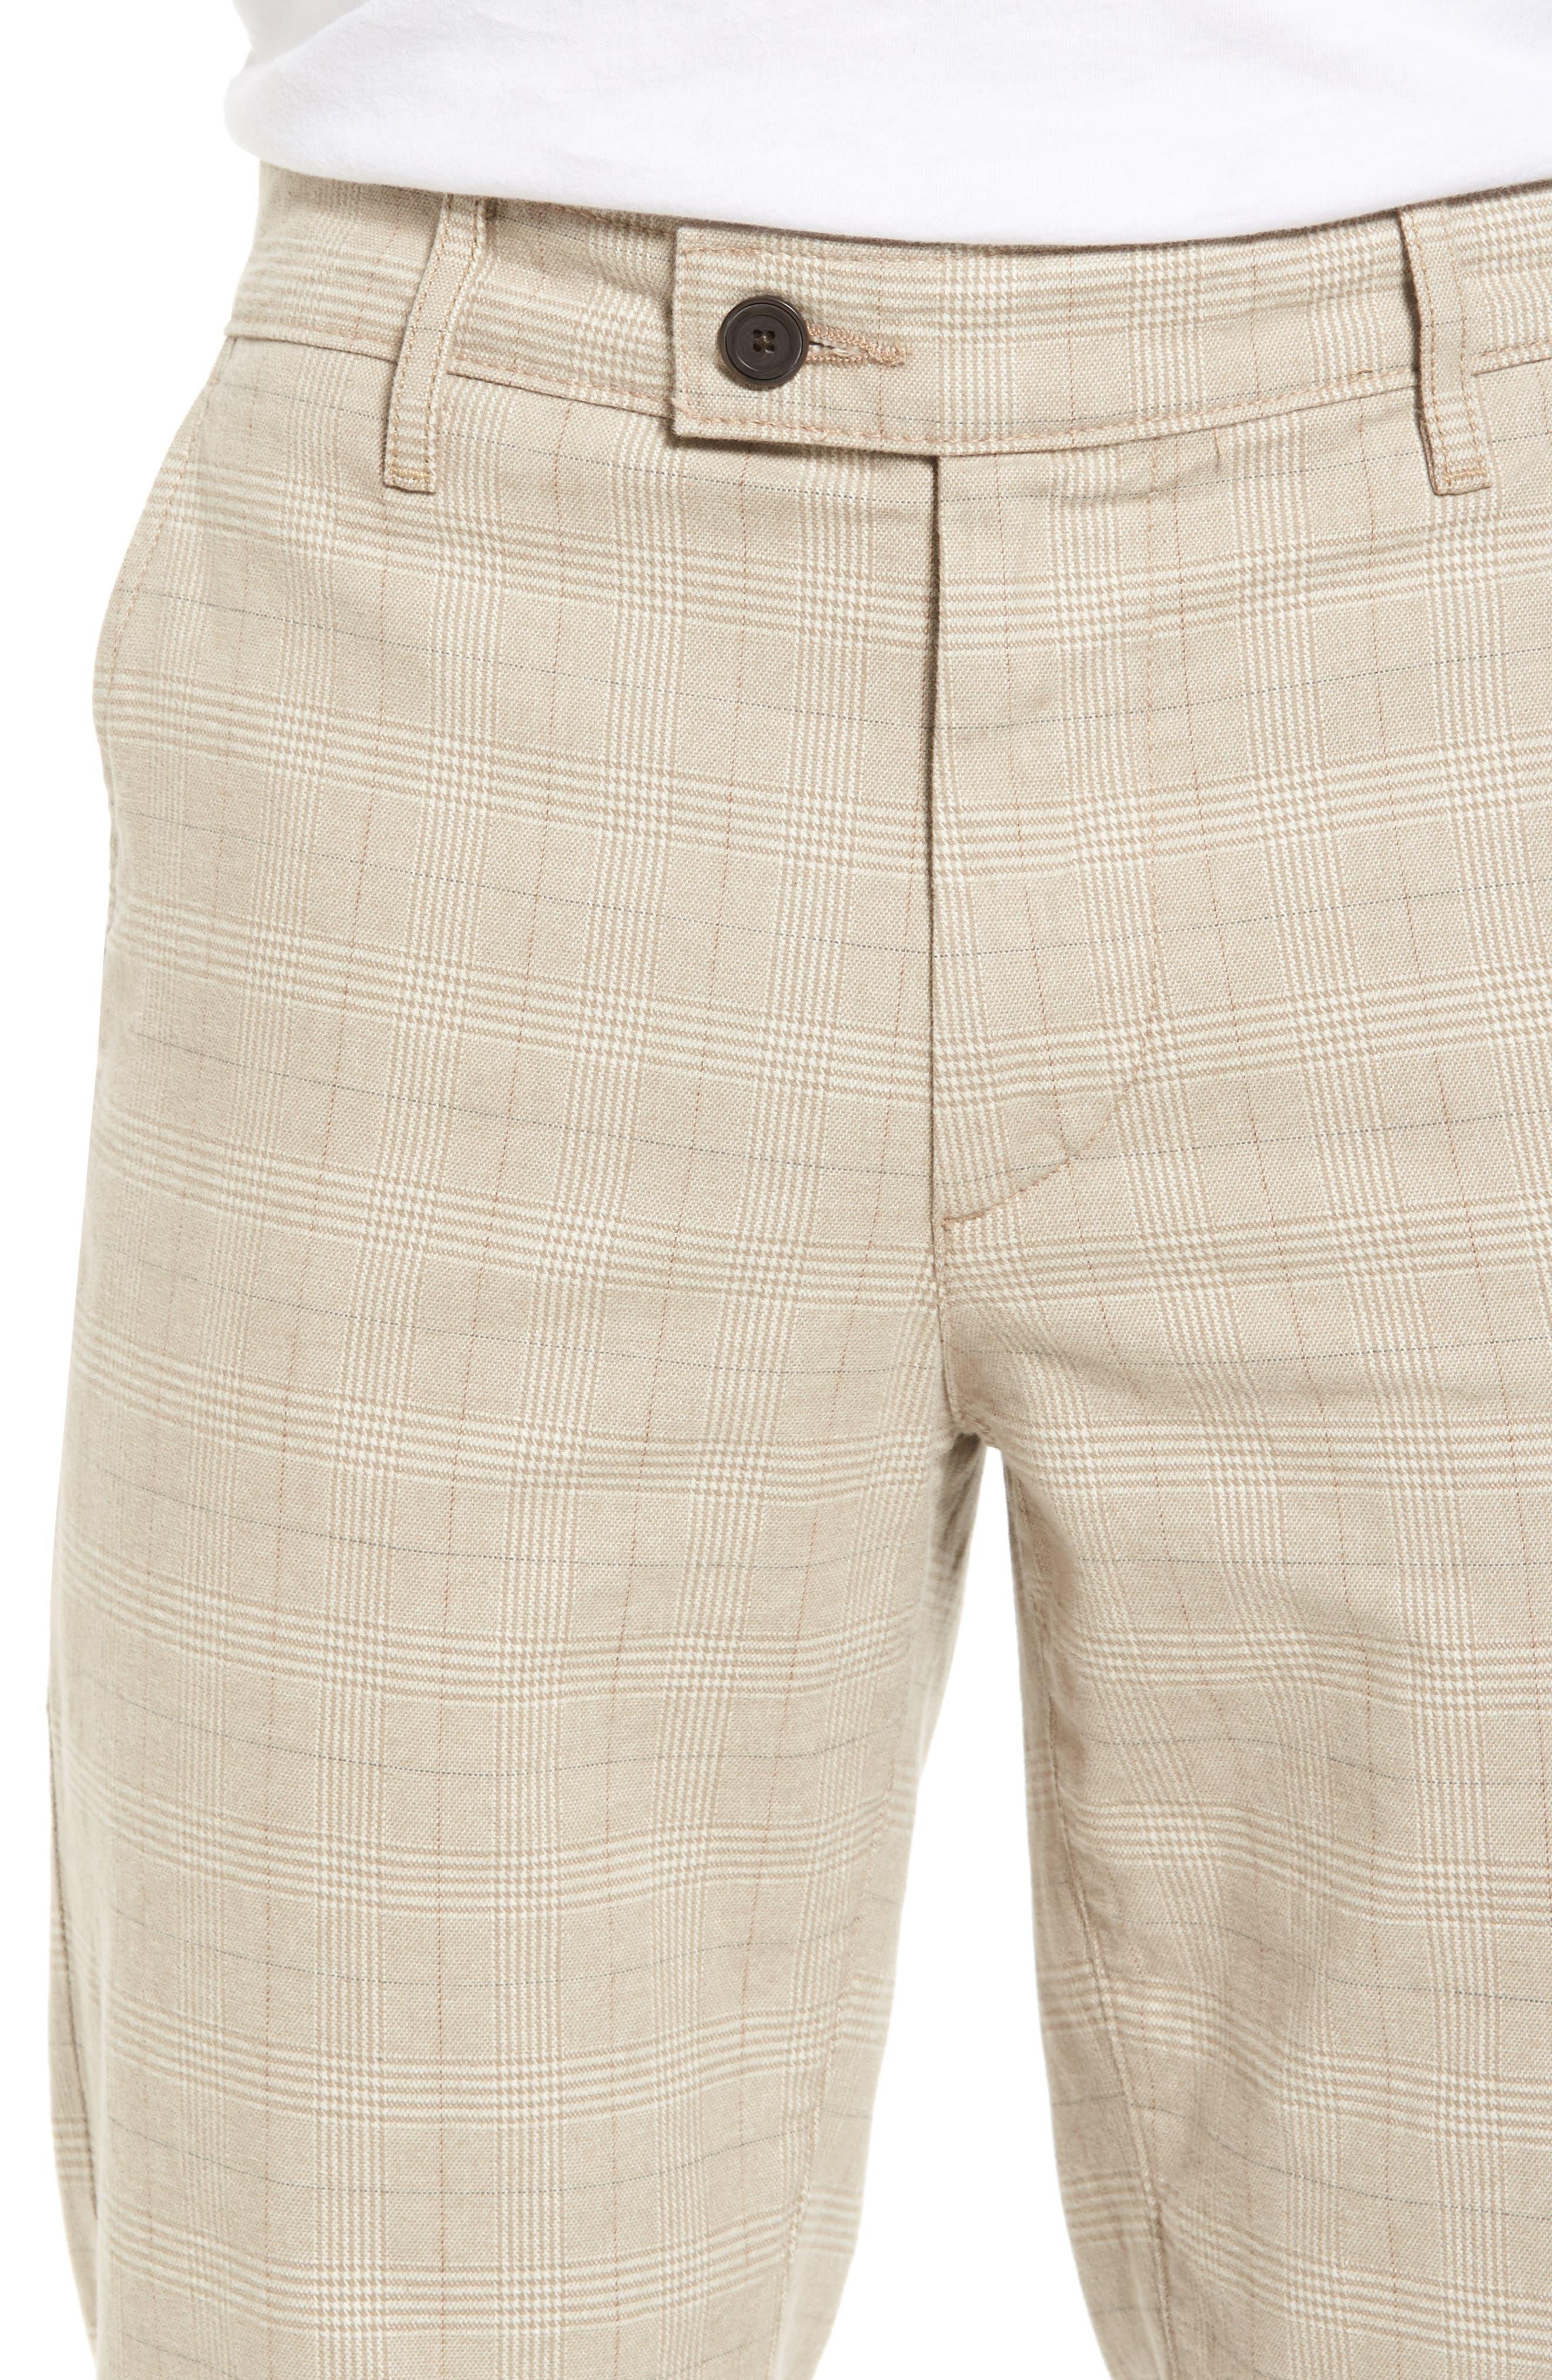 Marshall Slim Fit Pants,                             Alternate thumbnail 11, color,